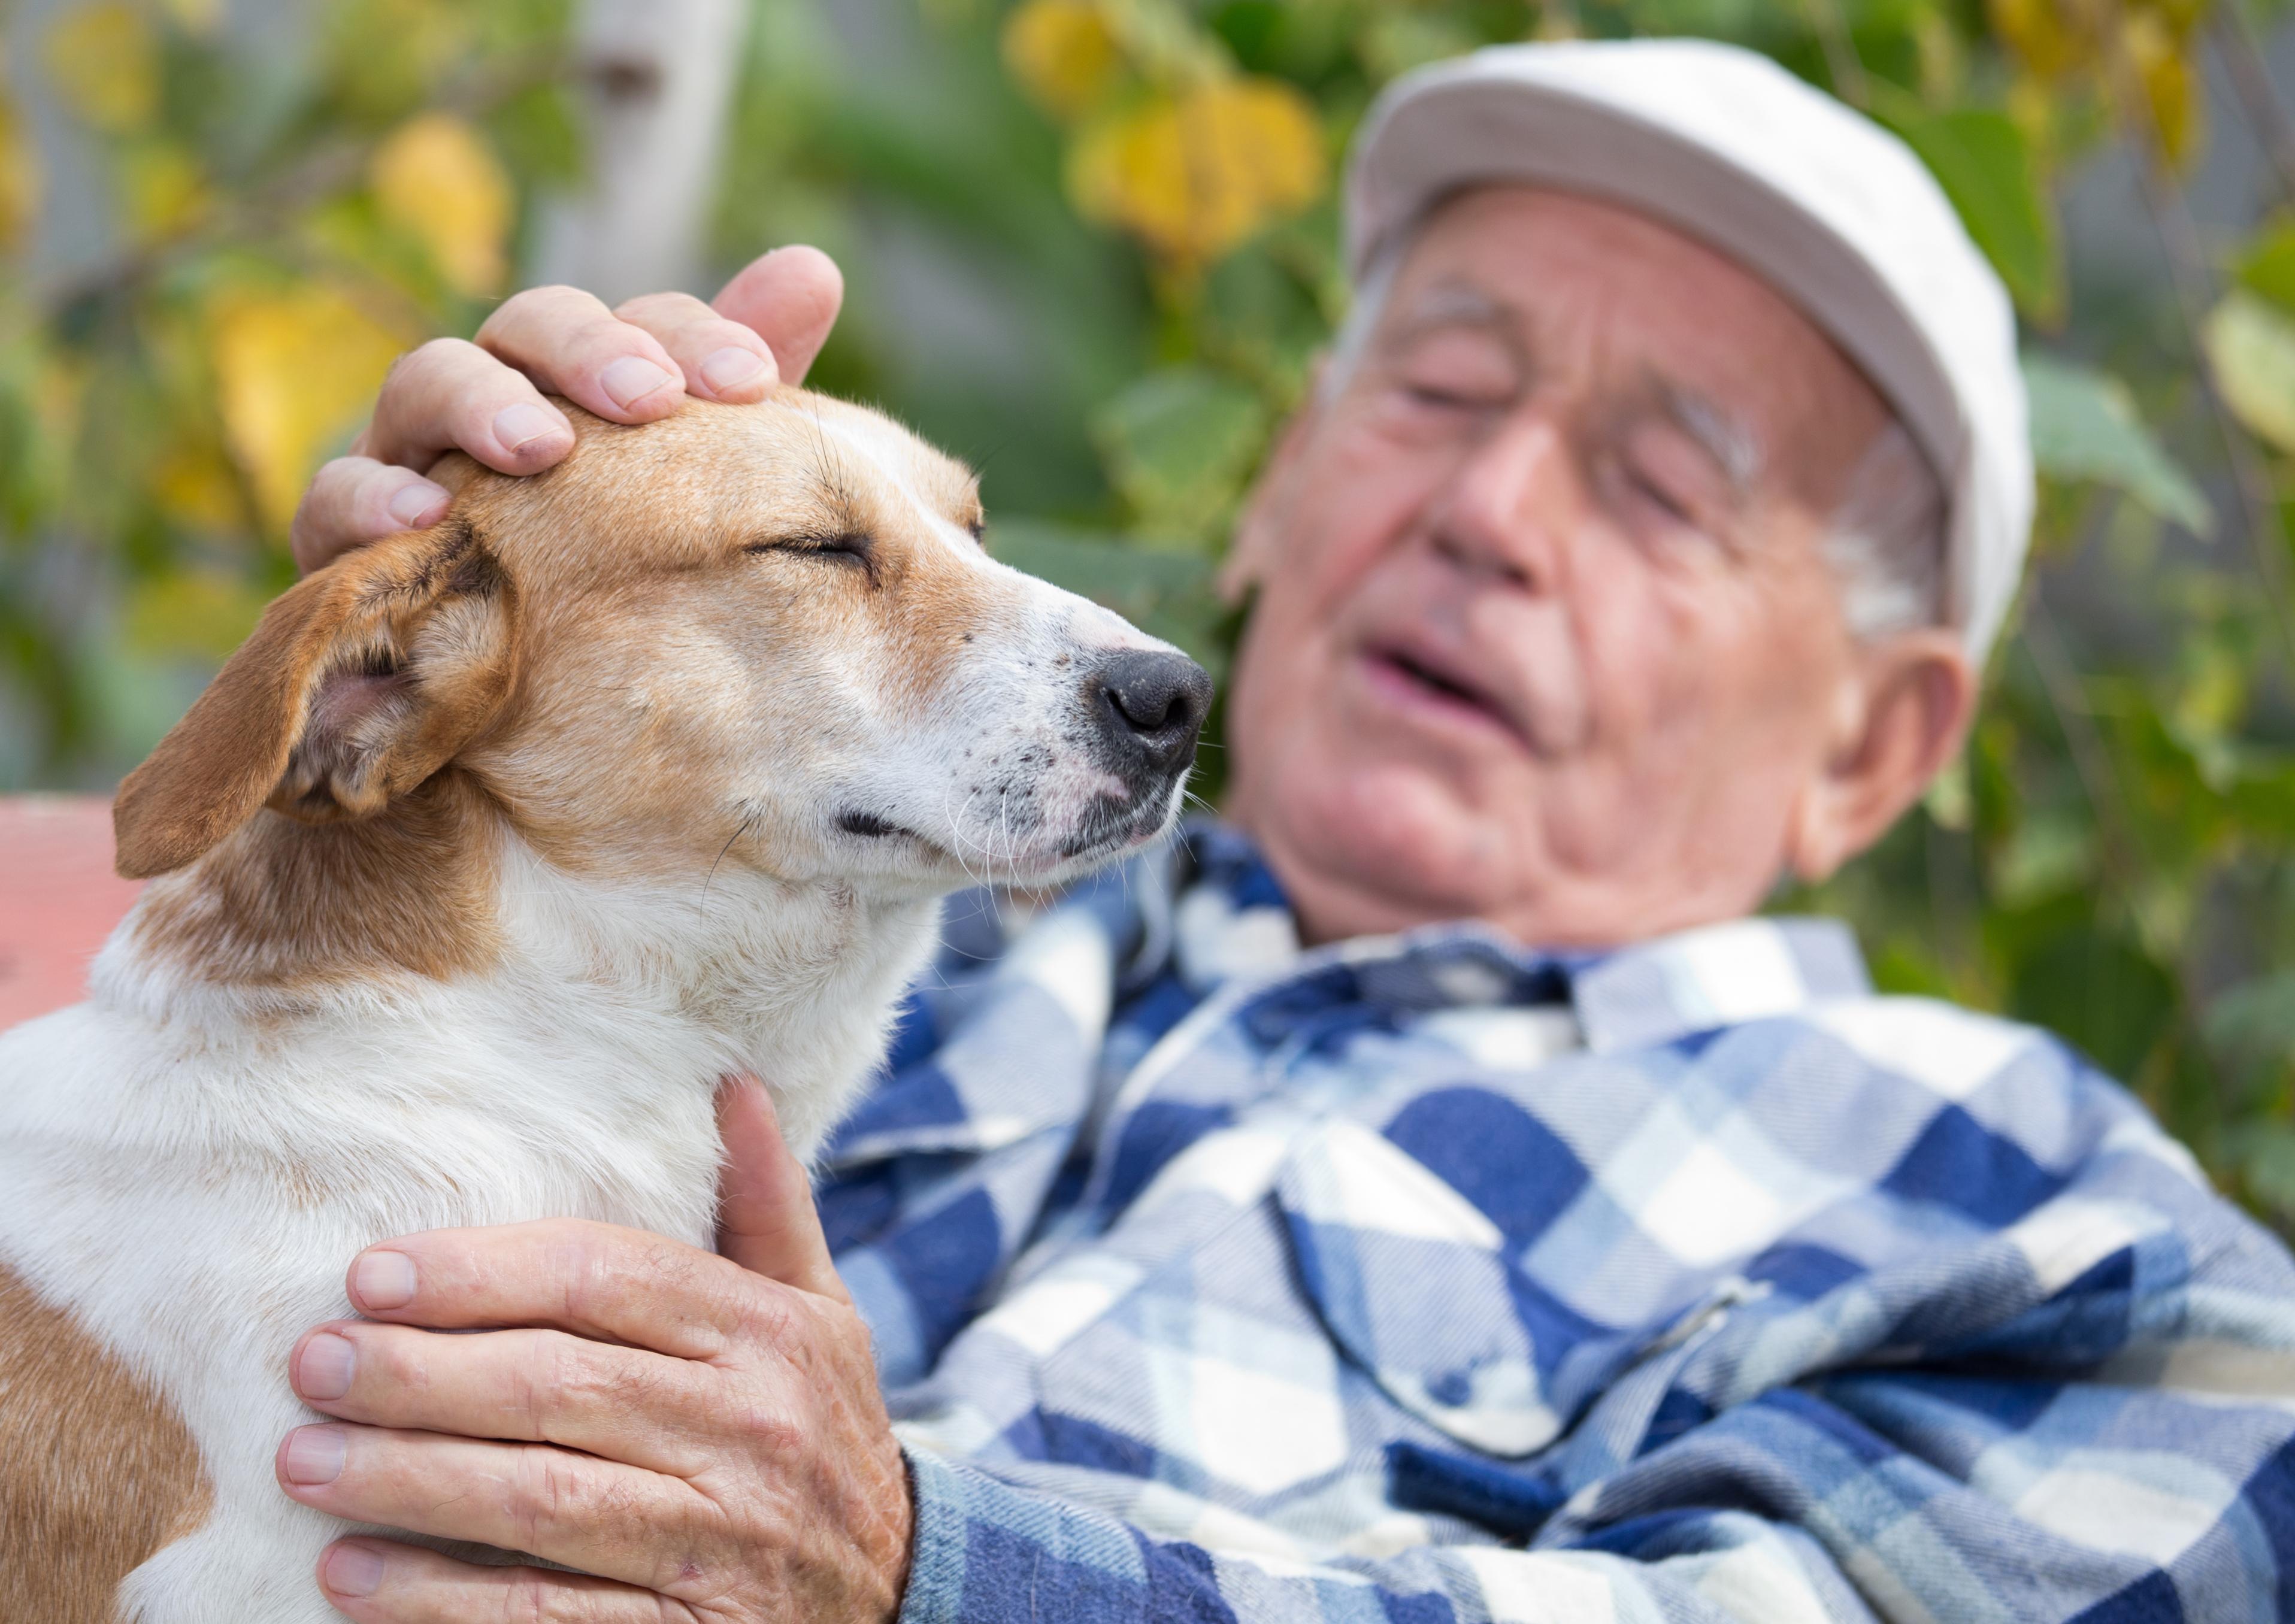 Senior man sitting on bench and cuddling